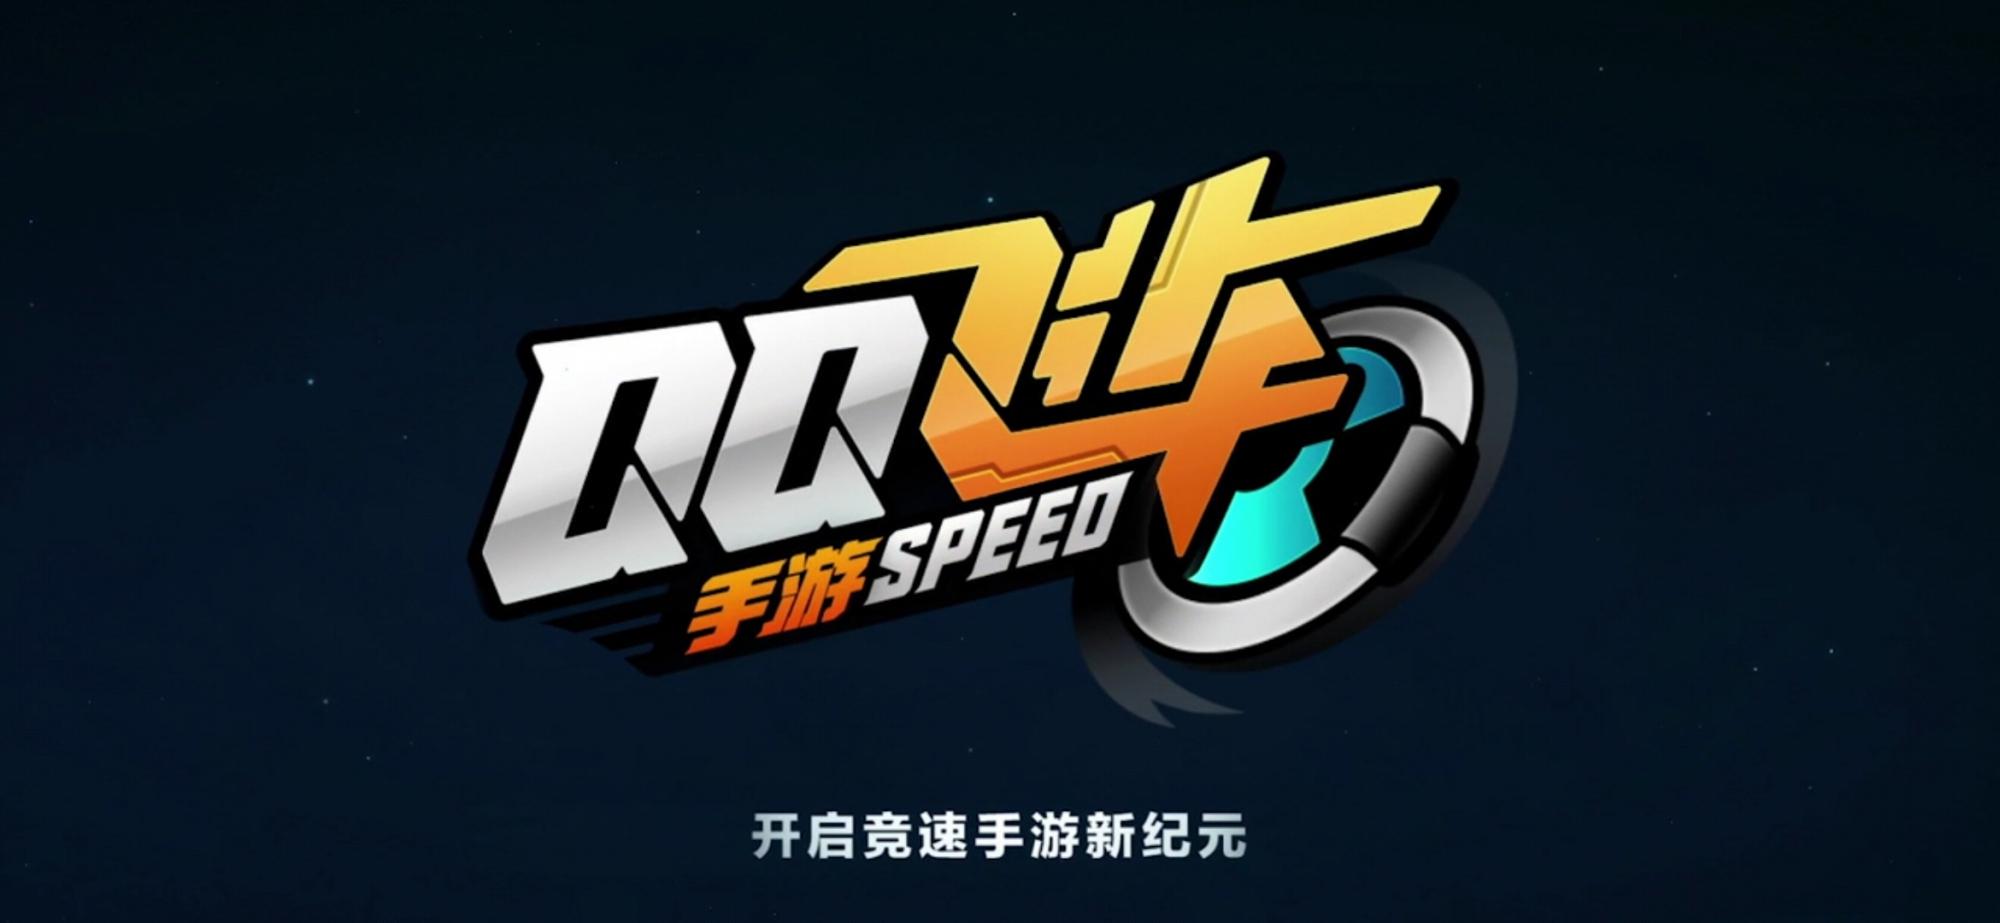 Screenshot_20190530_191349_com.tencent.tmgp.speed.jpg